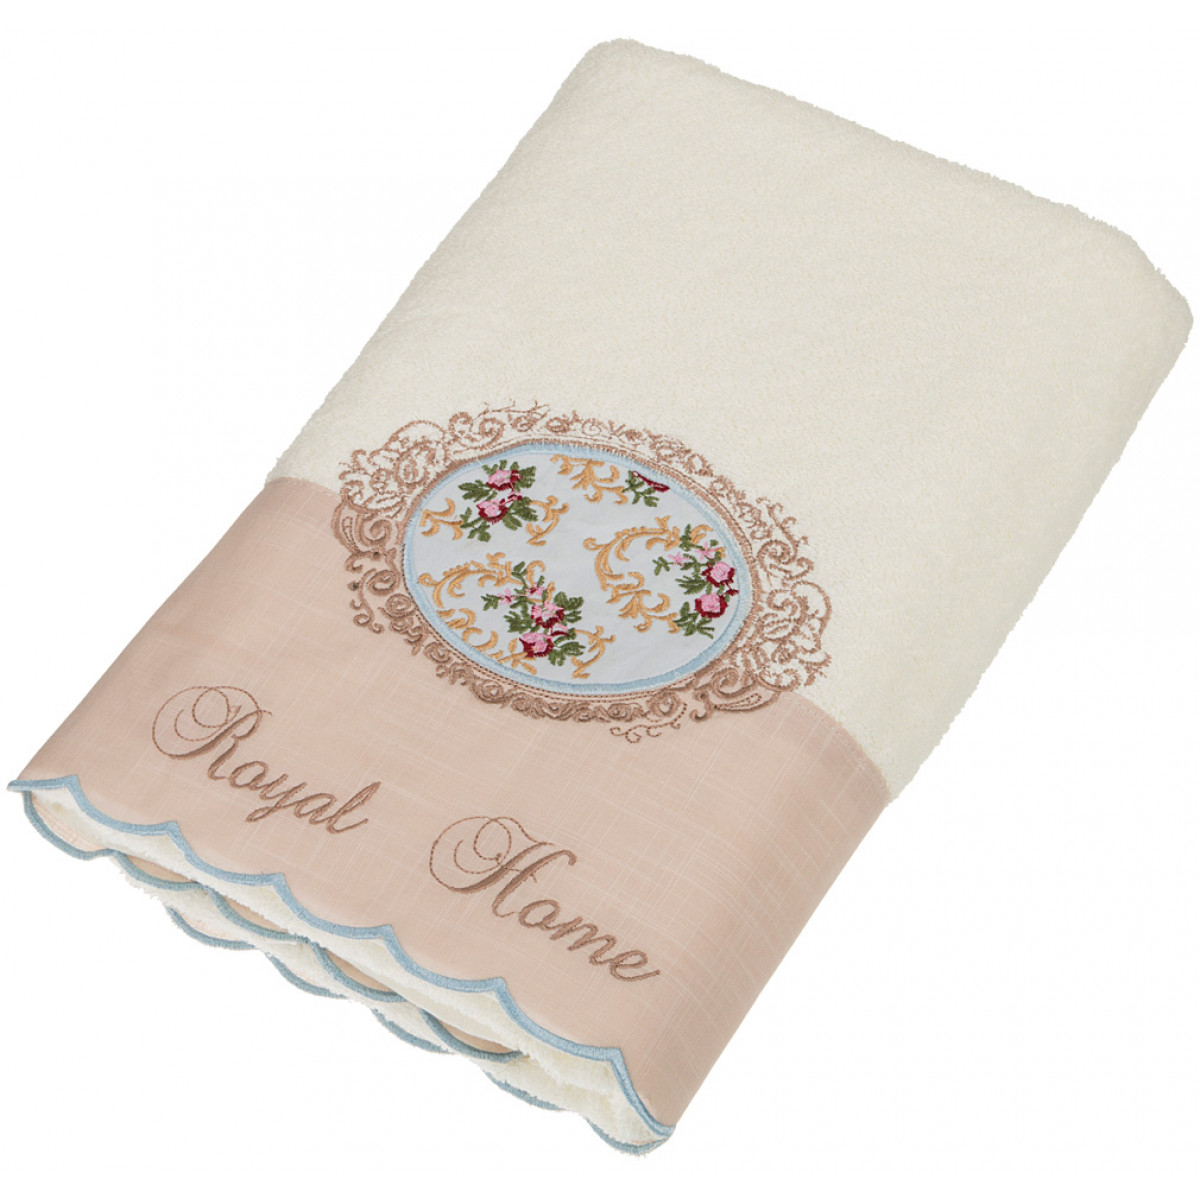 Полотенца Santalino Полотенце Abigall  (50х90 см) полотенца santalino полотенце shulamite 40х70 см